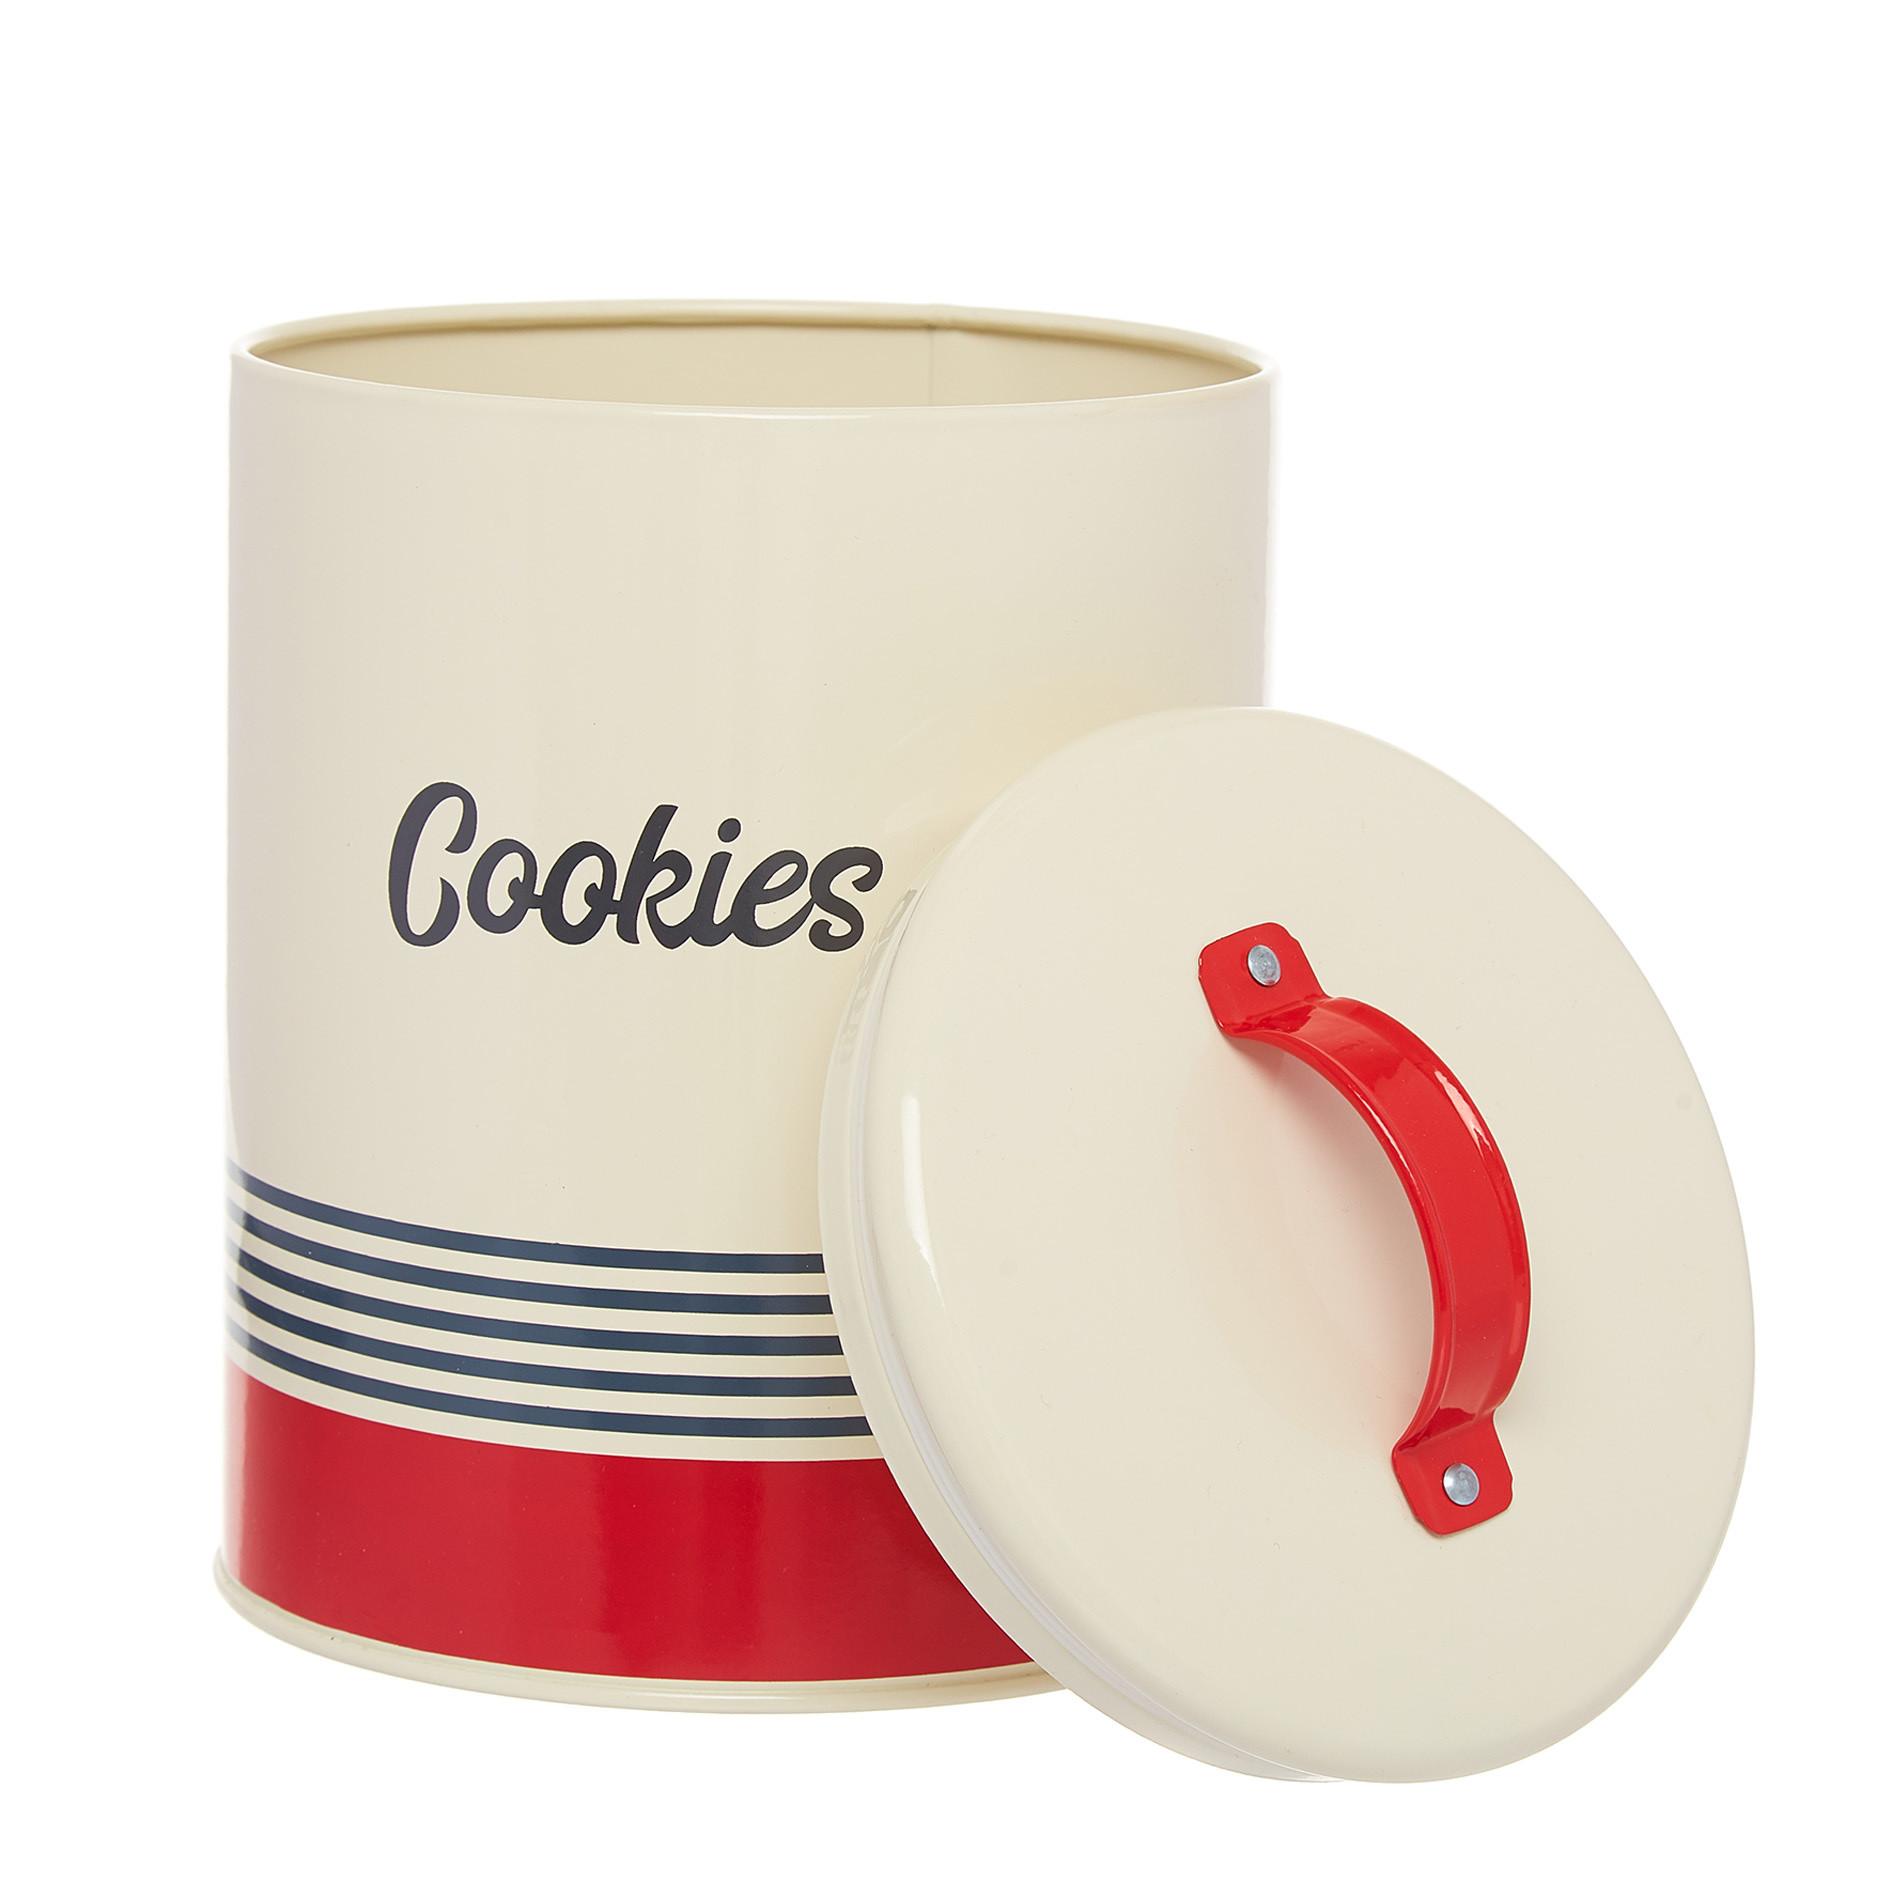 Barattolo ferro smaltato Cookies, Bianco/Rosso, large image number 1